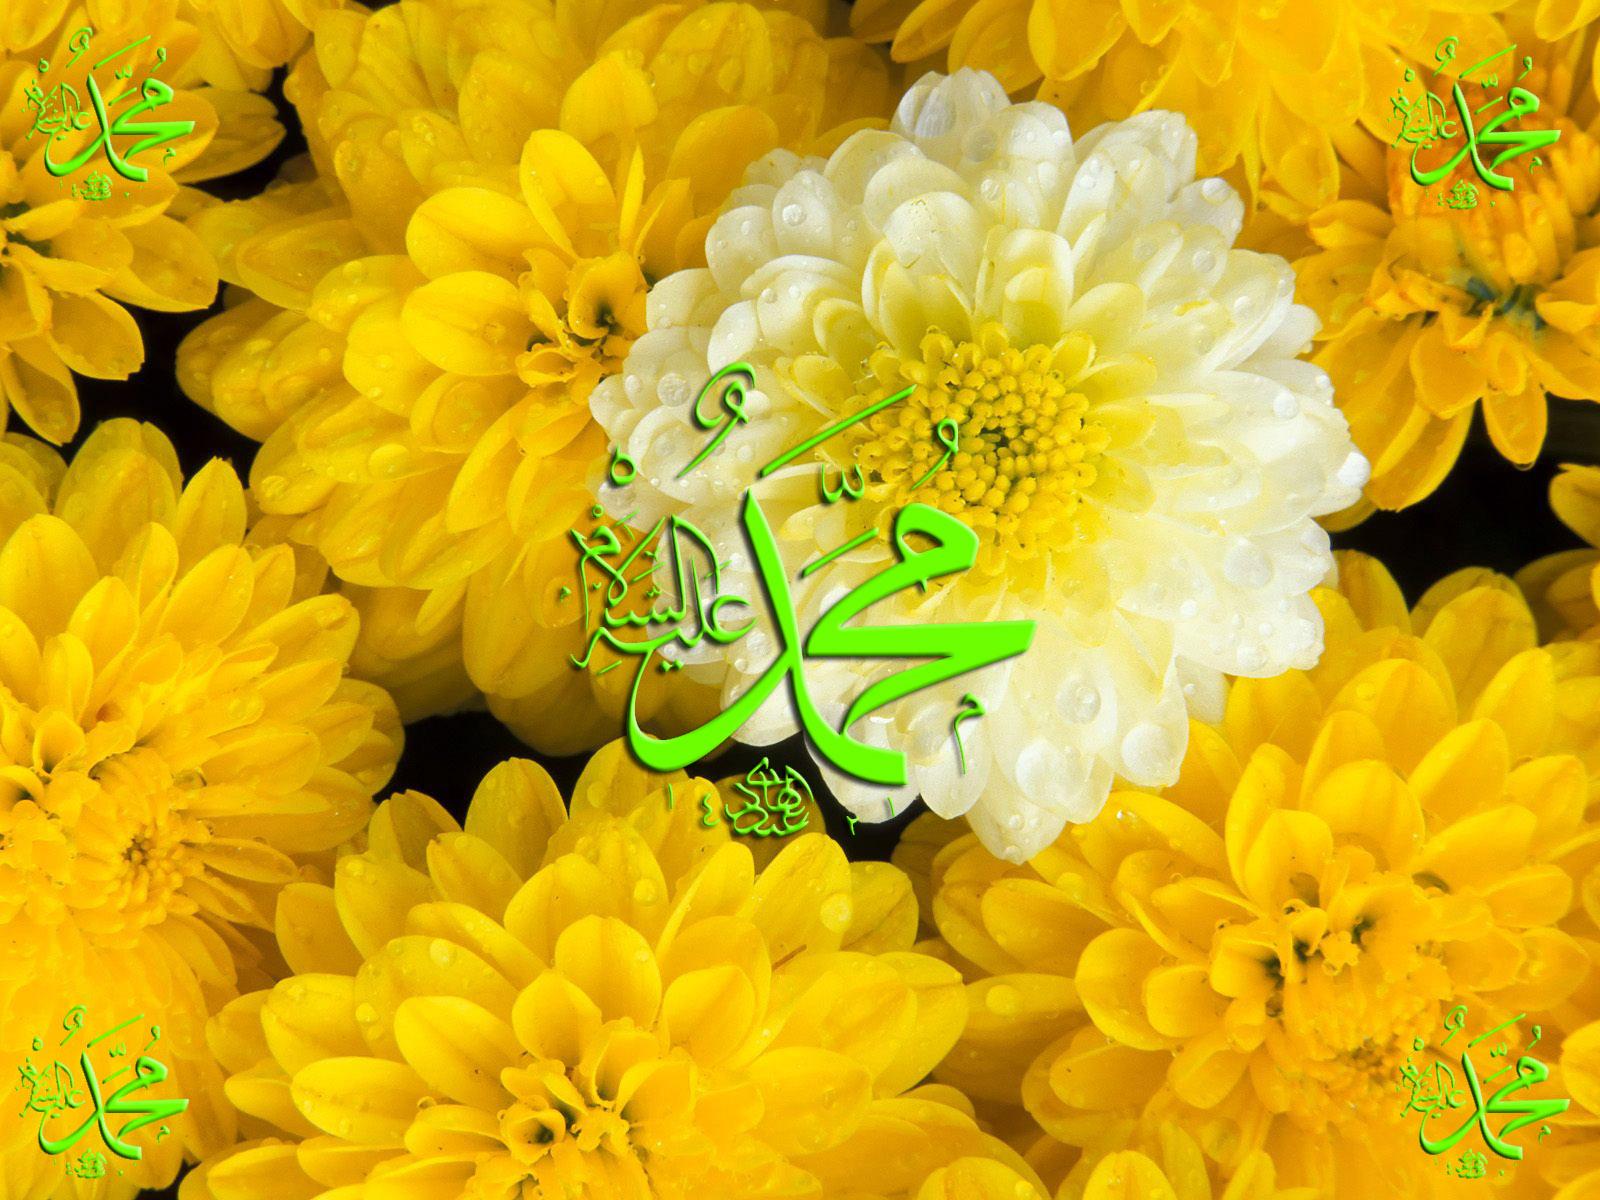 http://2.bp.blogspot.com/-P6bk63GXsdI/T14unofGCCI/AAAAAAAAAVs/JAYNgzxPAno/s1600/I+love+Muhammad+%28pbuh%29.jpg